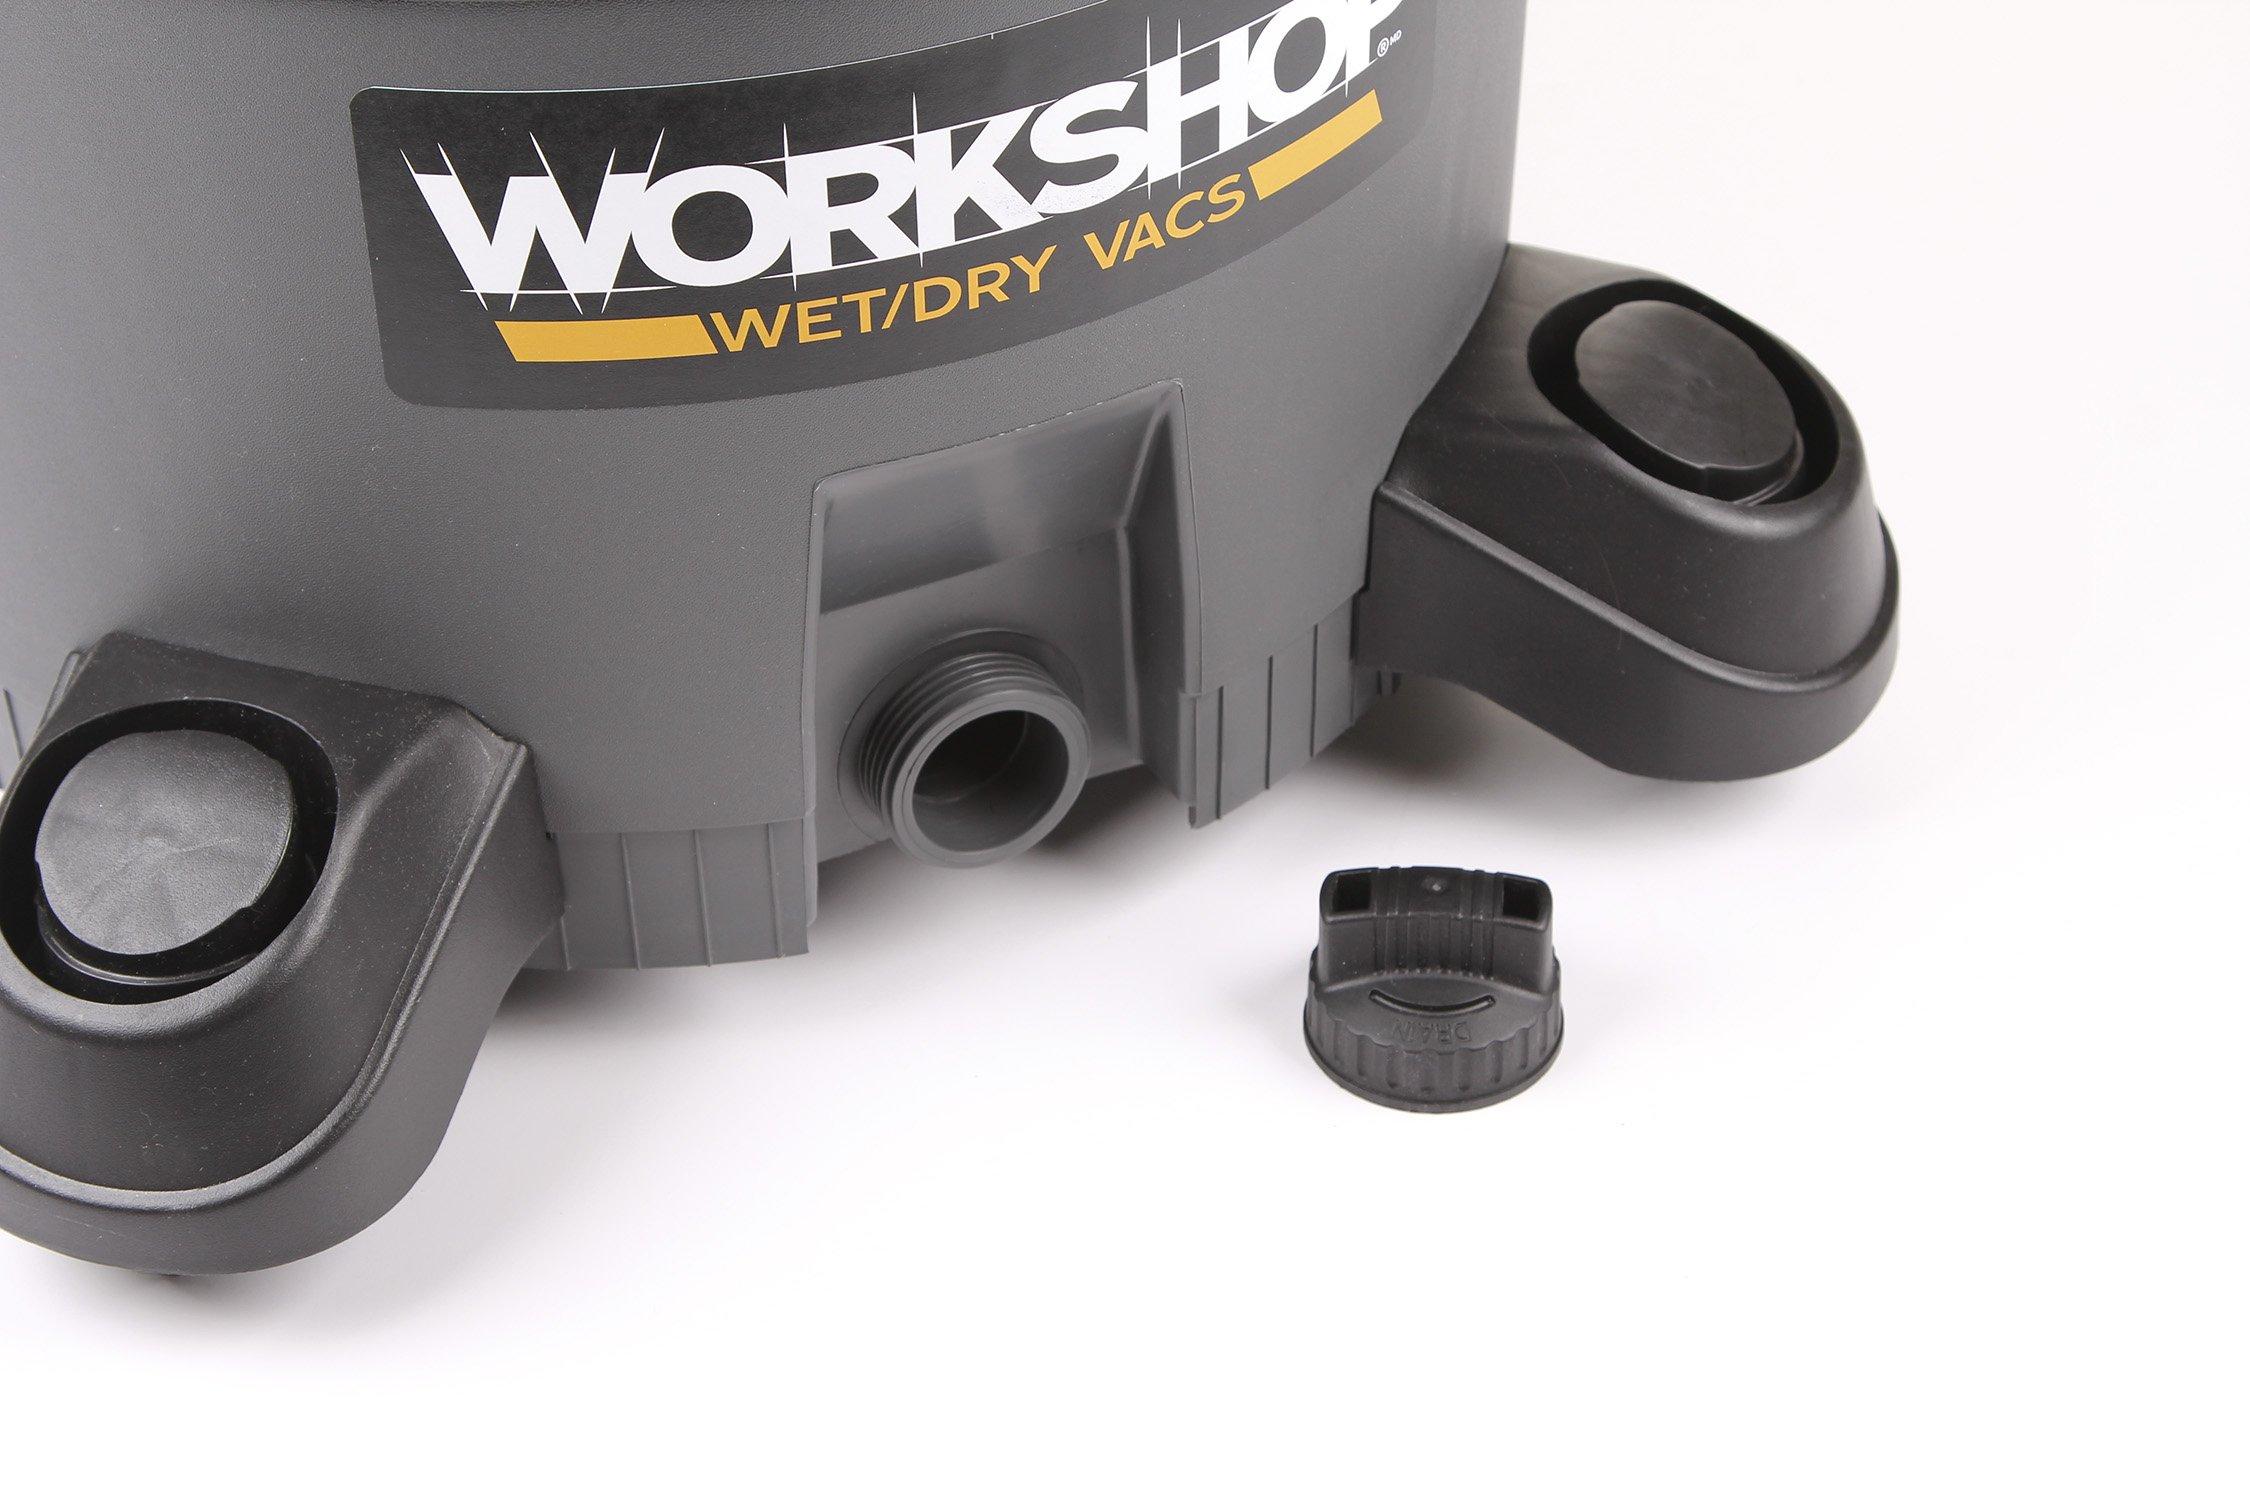 WORKSHOP Wet Dry Vac WS1200VA Heavy Duty General Purpose Wet Dry Vacuum Cleaner, 12-Gallon Shop Vacuum Cleaner, 5.0 Peak HP Wet And Dry Vacuum by Workshop (Image #8)